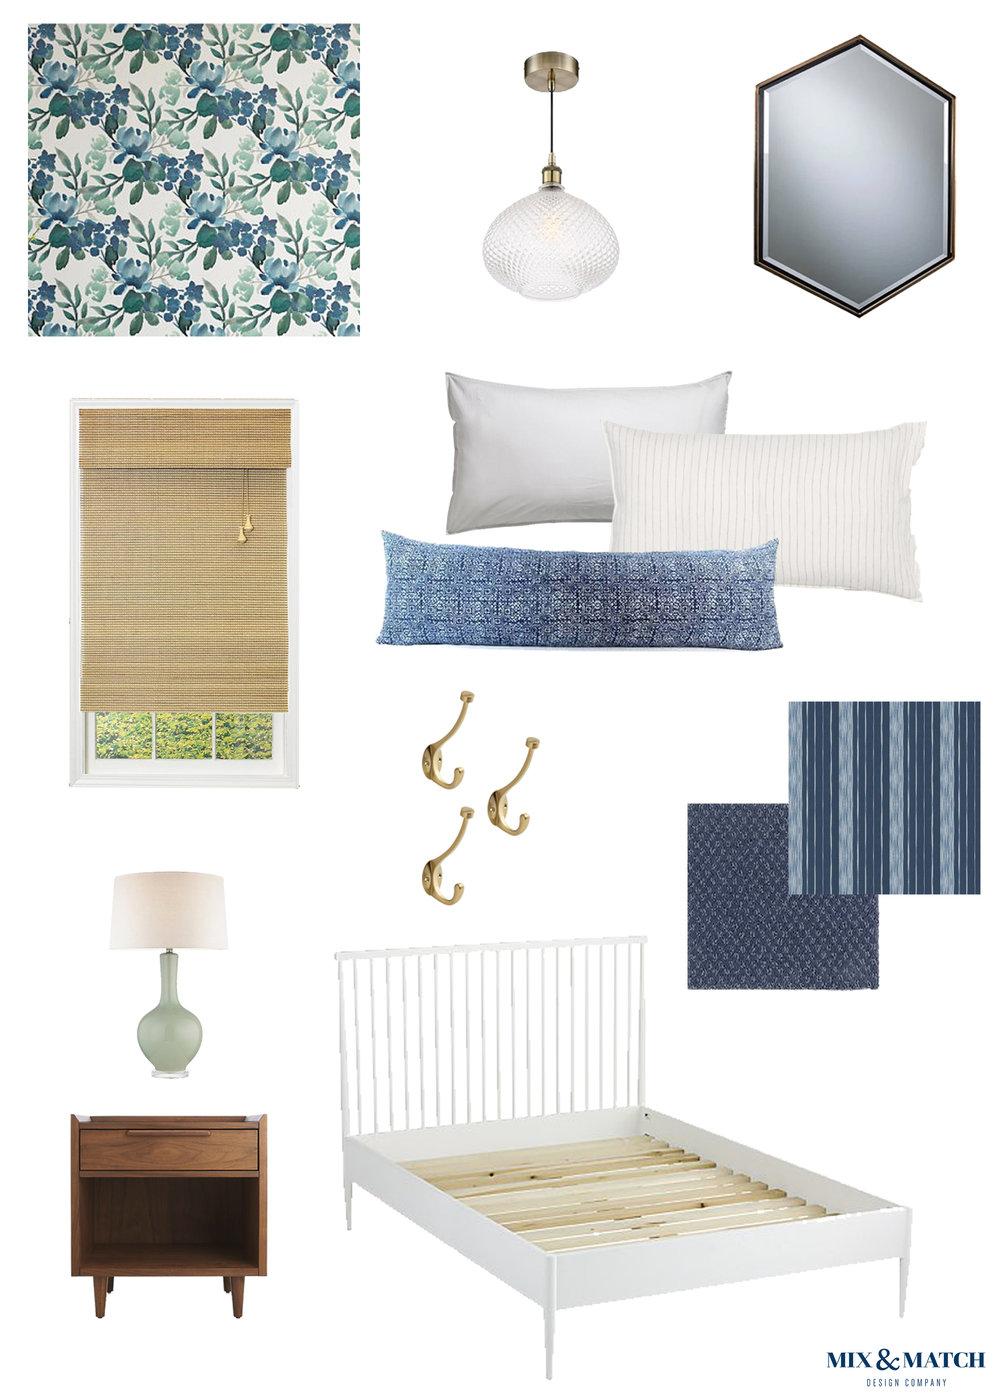 Guest-Bedroom-Mood-Board---Blue-Green-Wallpaper-Modern-Eclectic.jpg